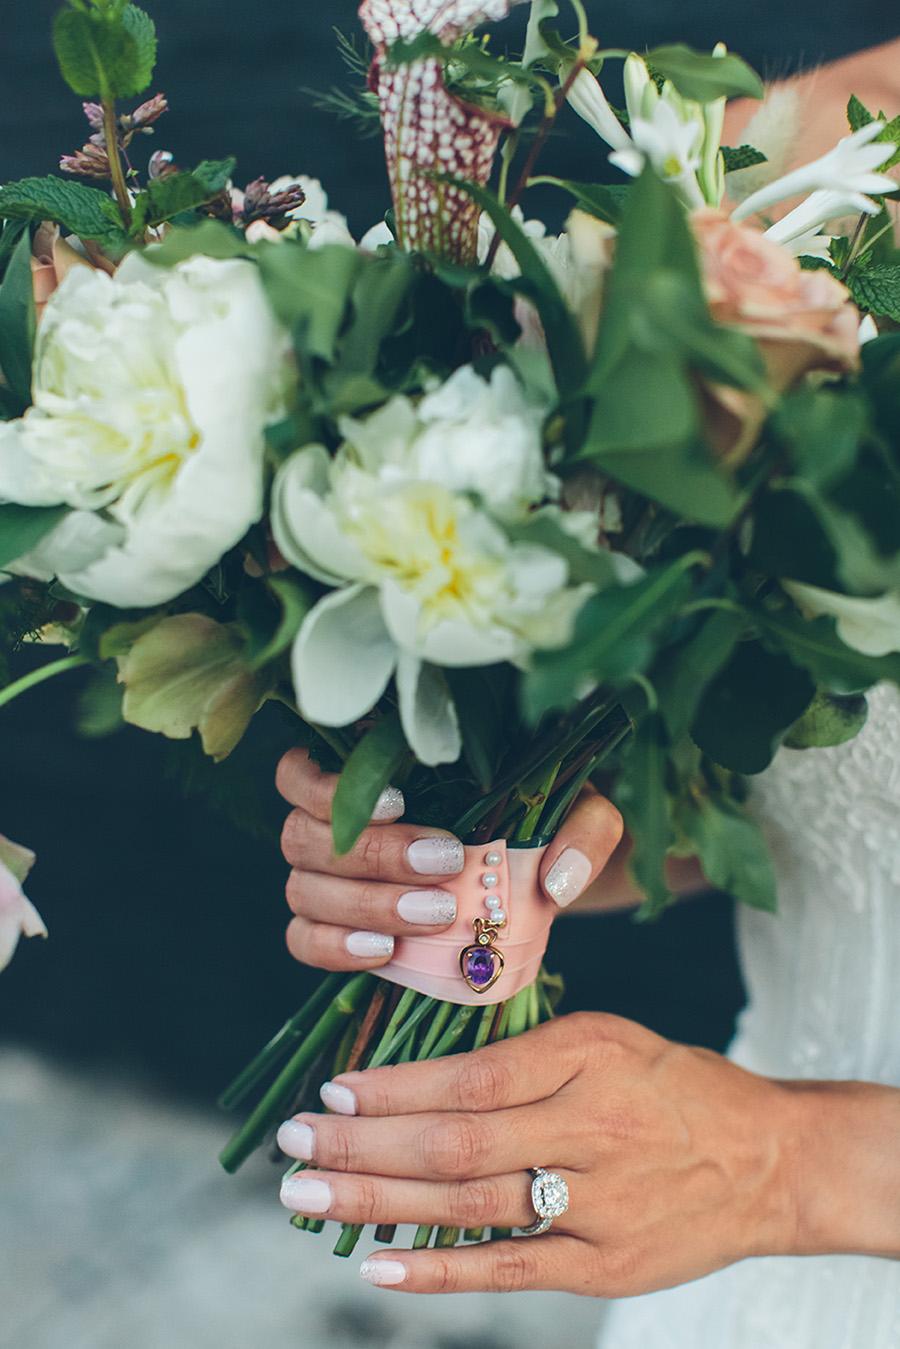 NYC-WEDDING-PHOTOGRAPHER-CITYHALL-ELOPEMENT-501-UNION-BROOKLYN-WEDDING-JILL-JUSTIN0018.jpg